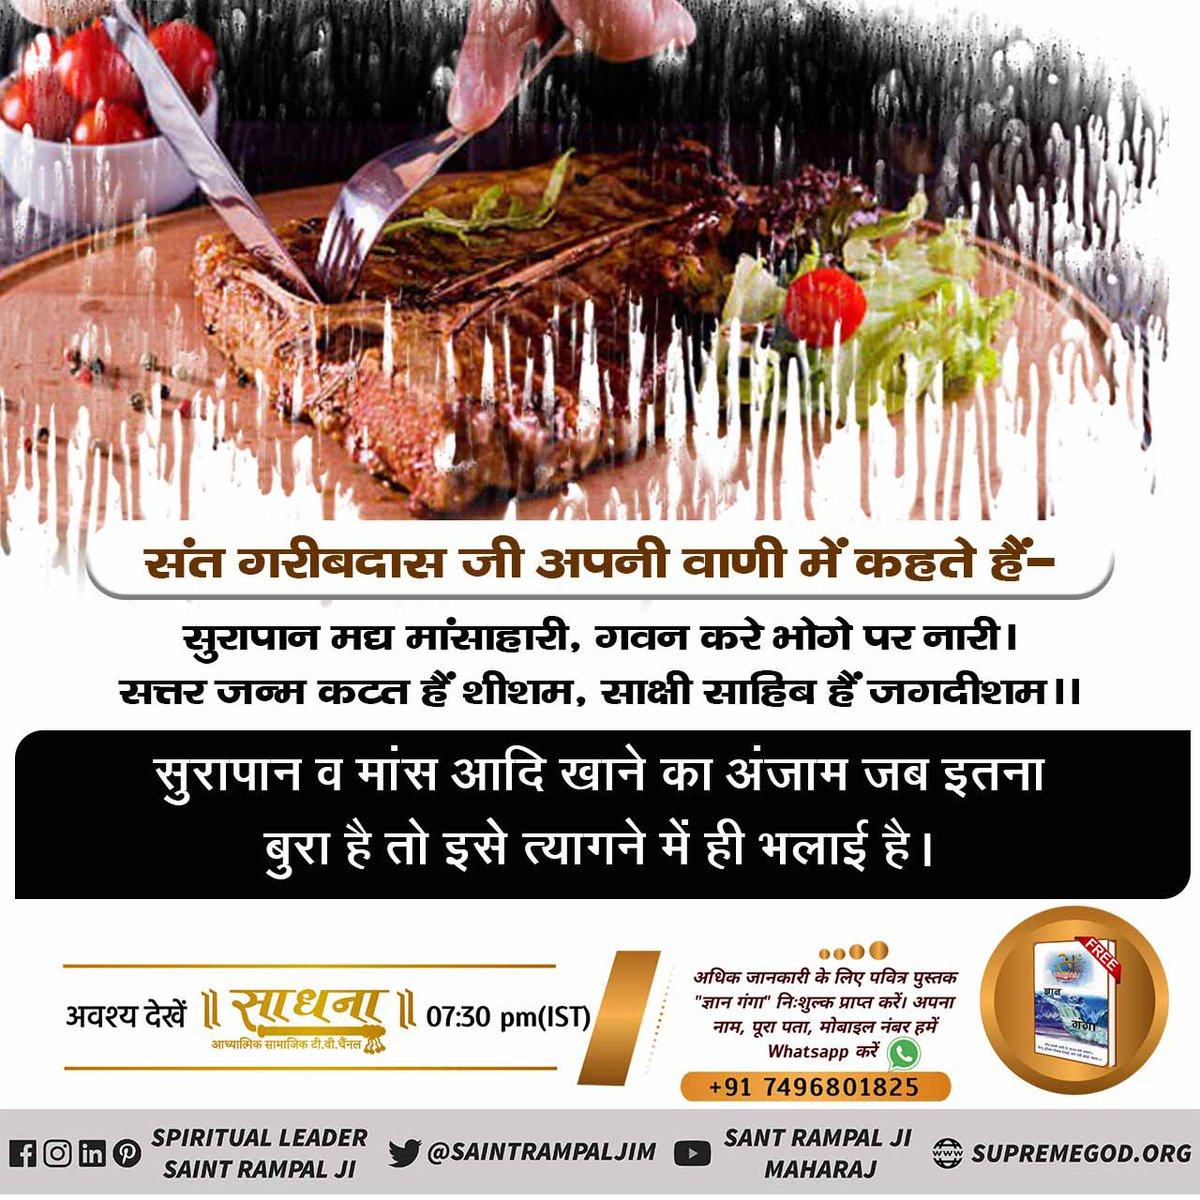 #GodMorningFriday  Don't Eat Meat  More information please visit satlok ashram youtube channel. https://t.co/wk9555Gh4G